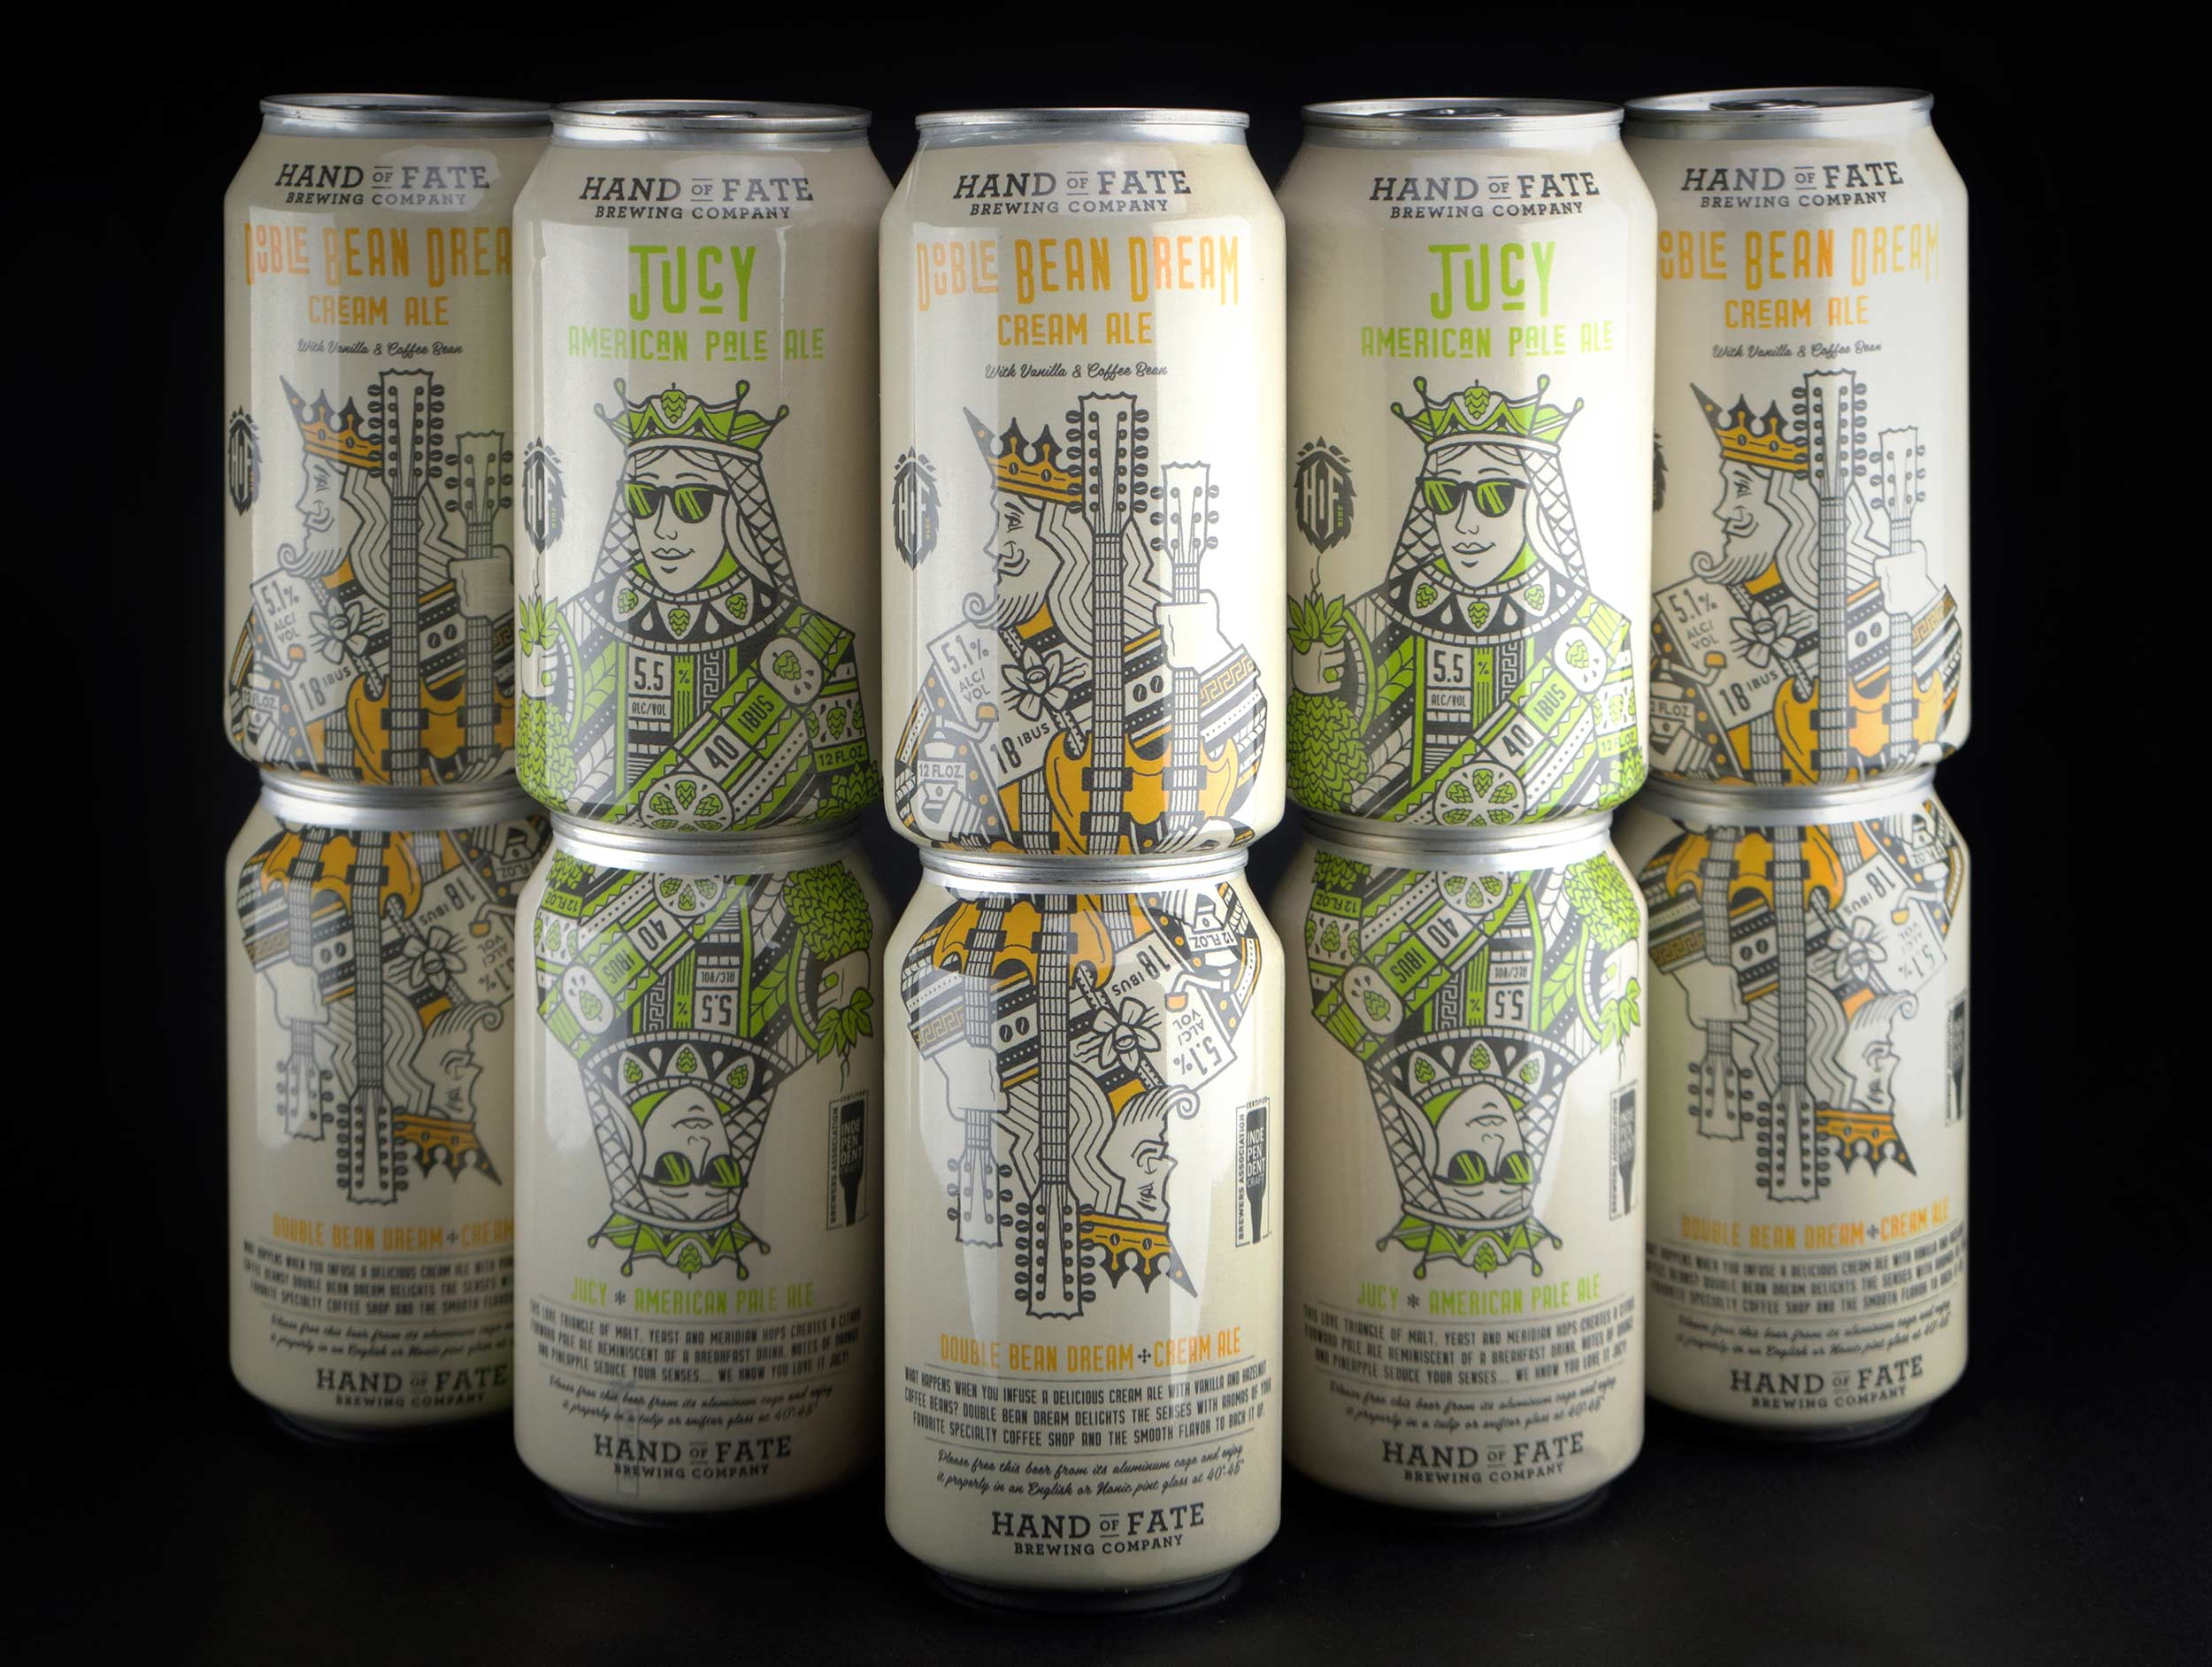 Craft-Beer-Packaging_Hand-Of-Fate-Brewery-Can-Design-Black.jpg